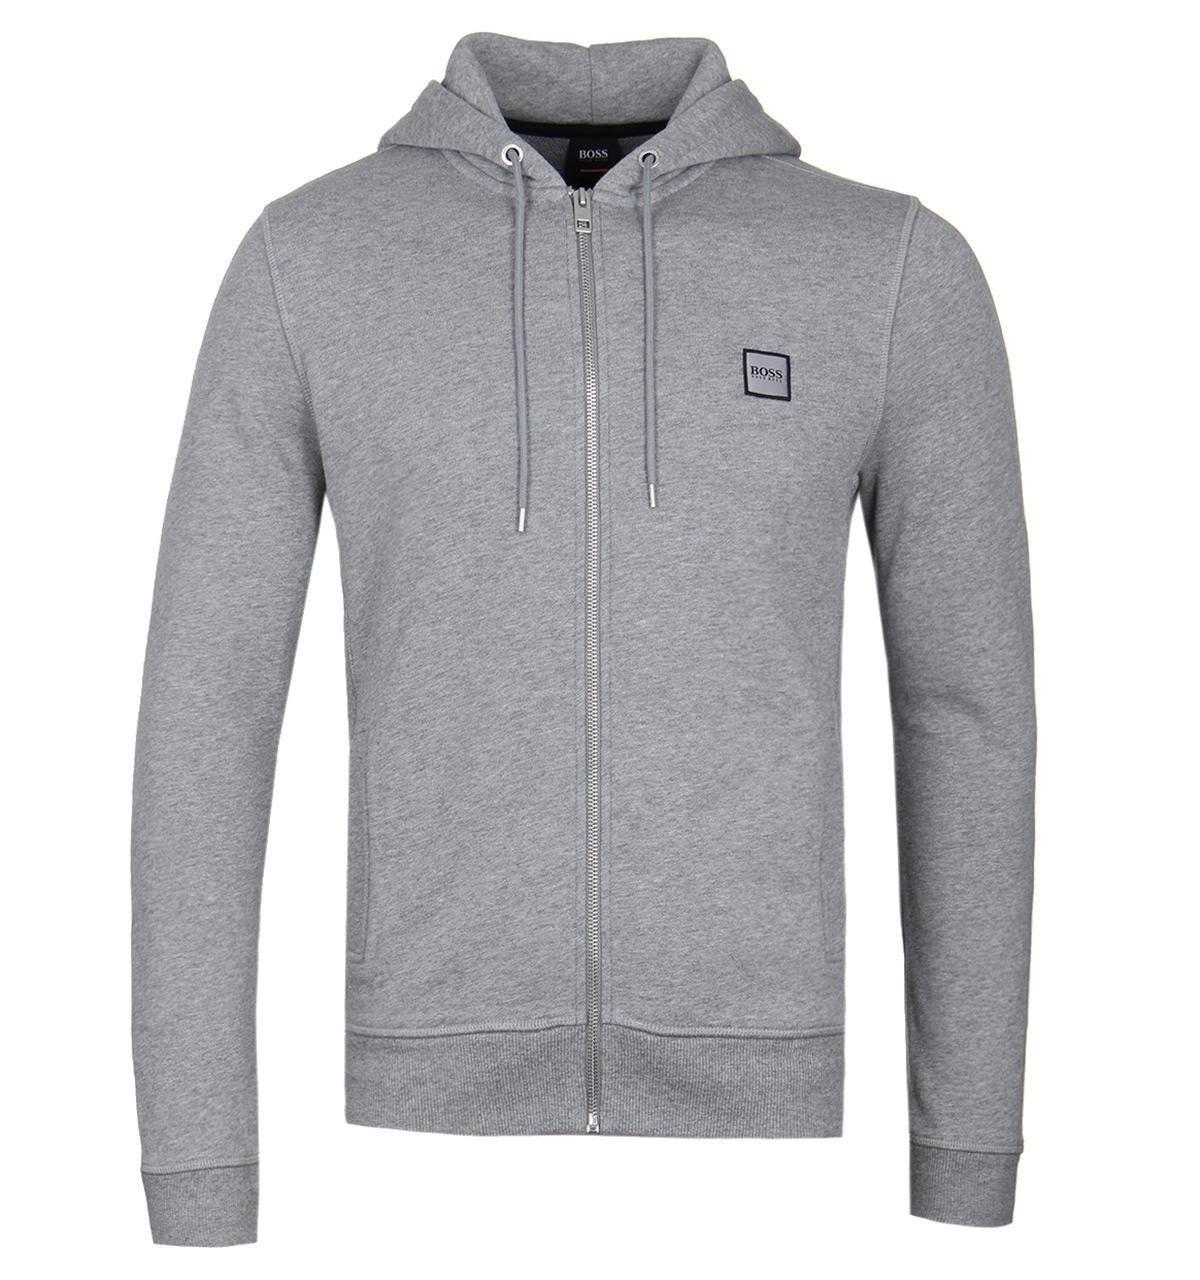 b8232b592 Lyst - BOSS by Hugo Boss Boss Znacks Grey Zip Hoodie in Gray for Men ...